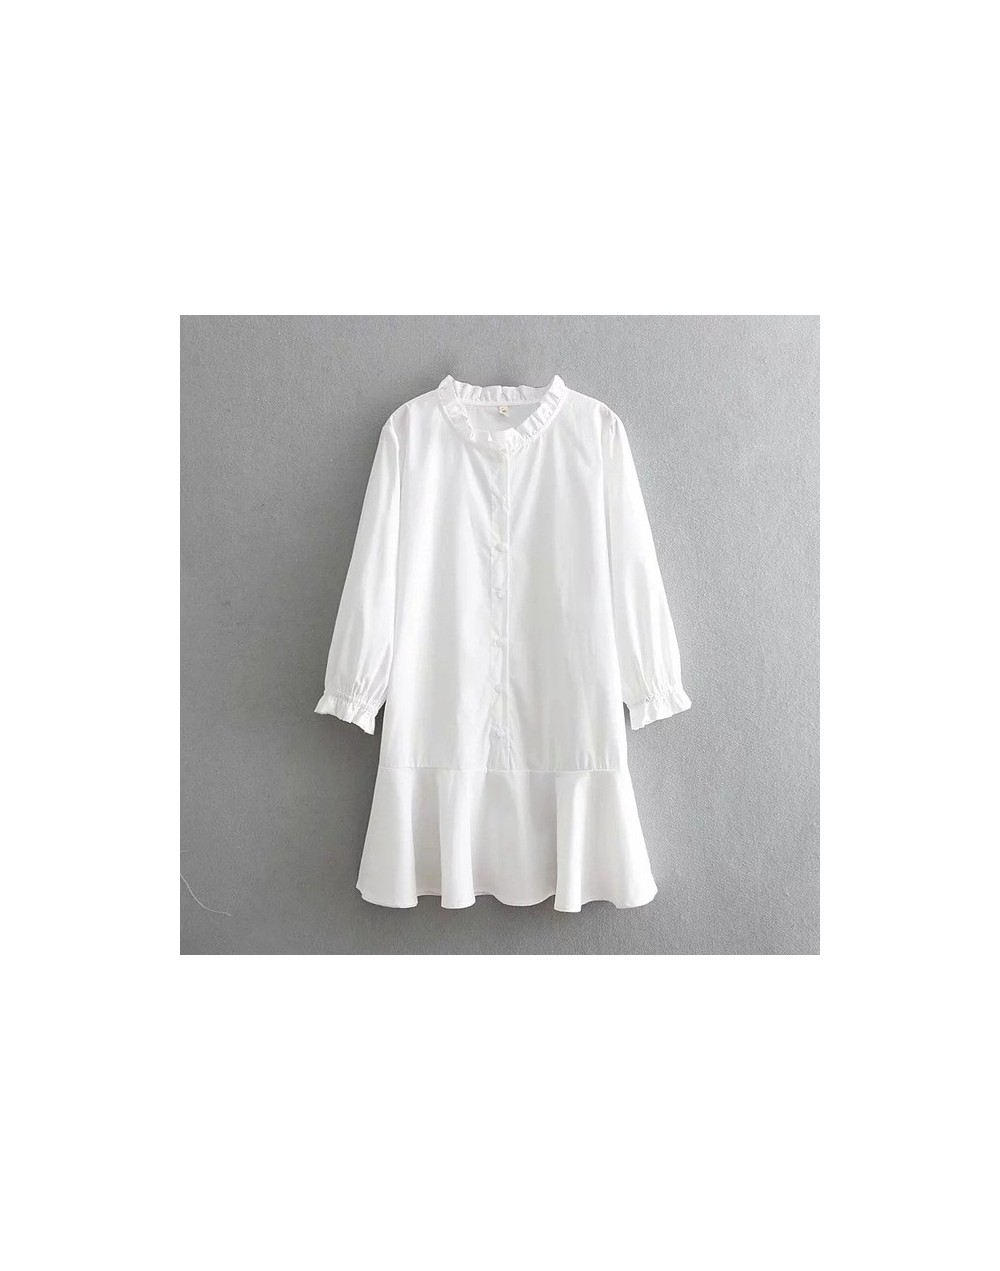 2019 Spring Long Sleeve White O Neck Collar Shirt Dress Women Casual Ruffle A Line Short Dresses Cotton Button Dress - white...